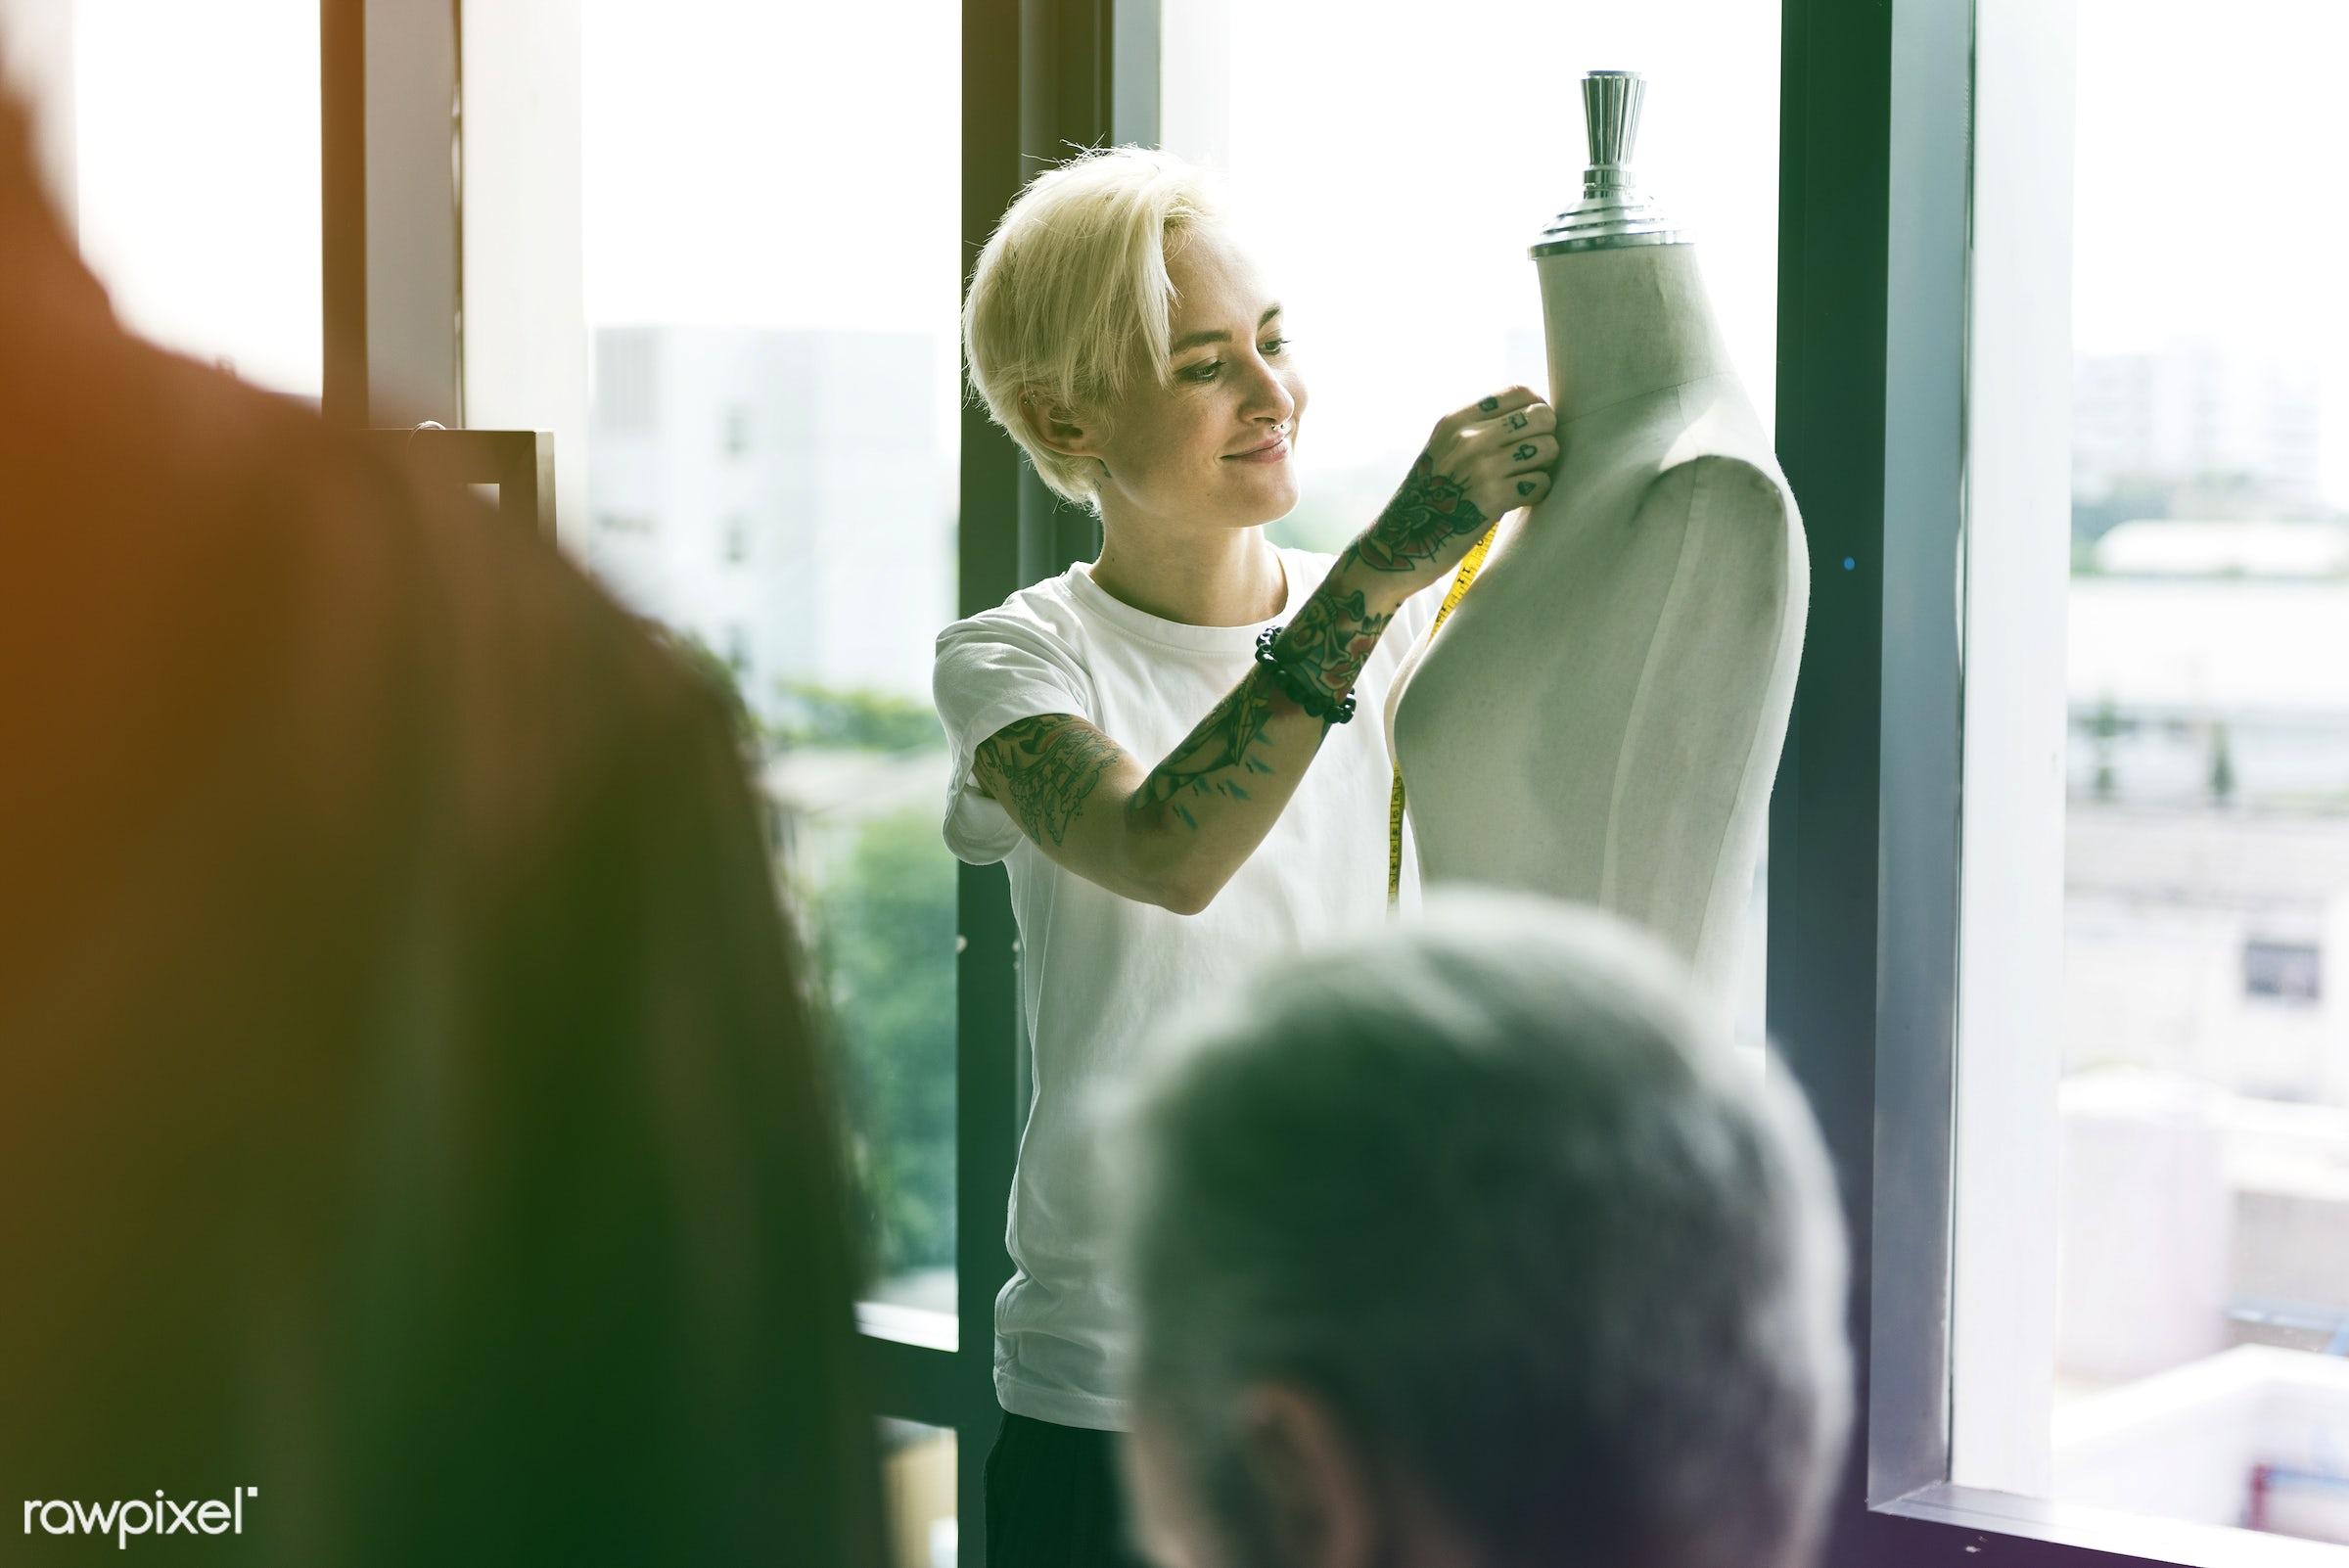 designing, dressmaker, faded, vibrant, mannequin, inspiration, measuring tape, materials, blend, light, creative, clothes,...